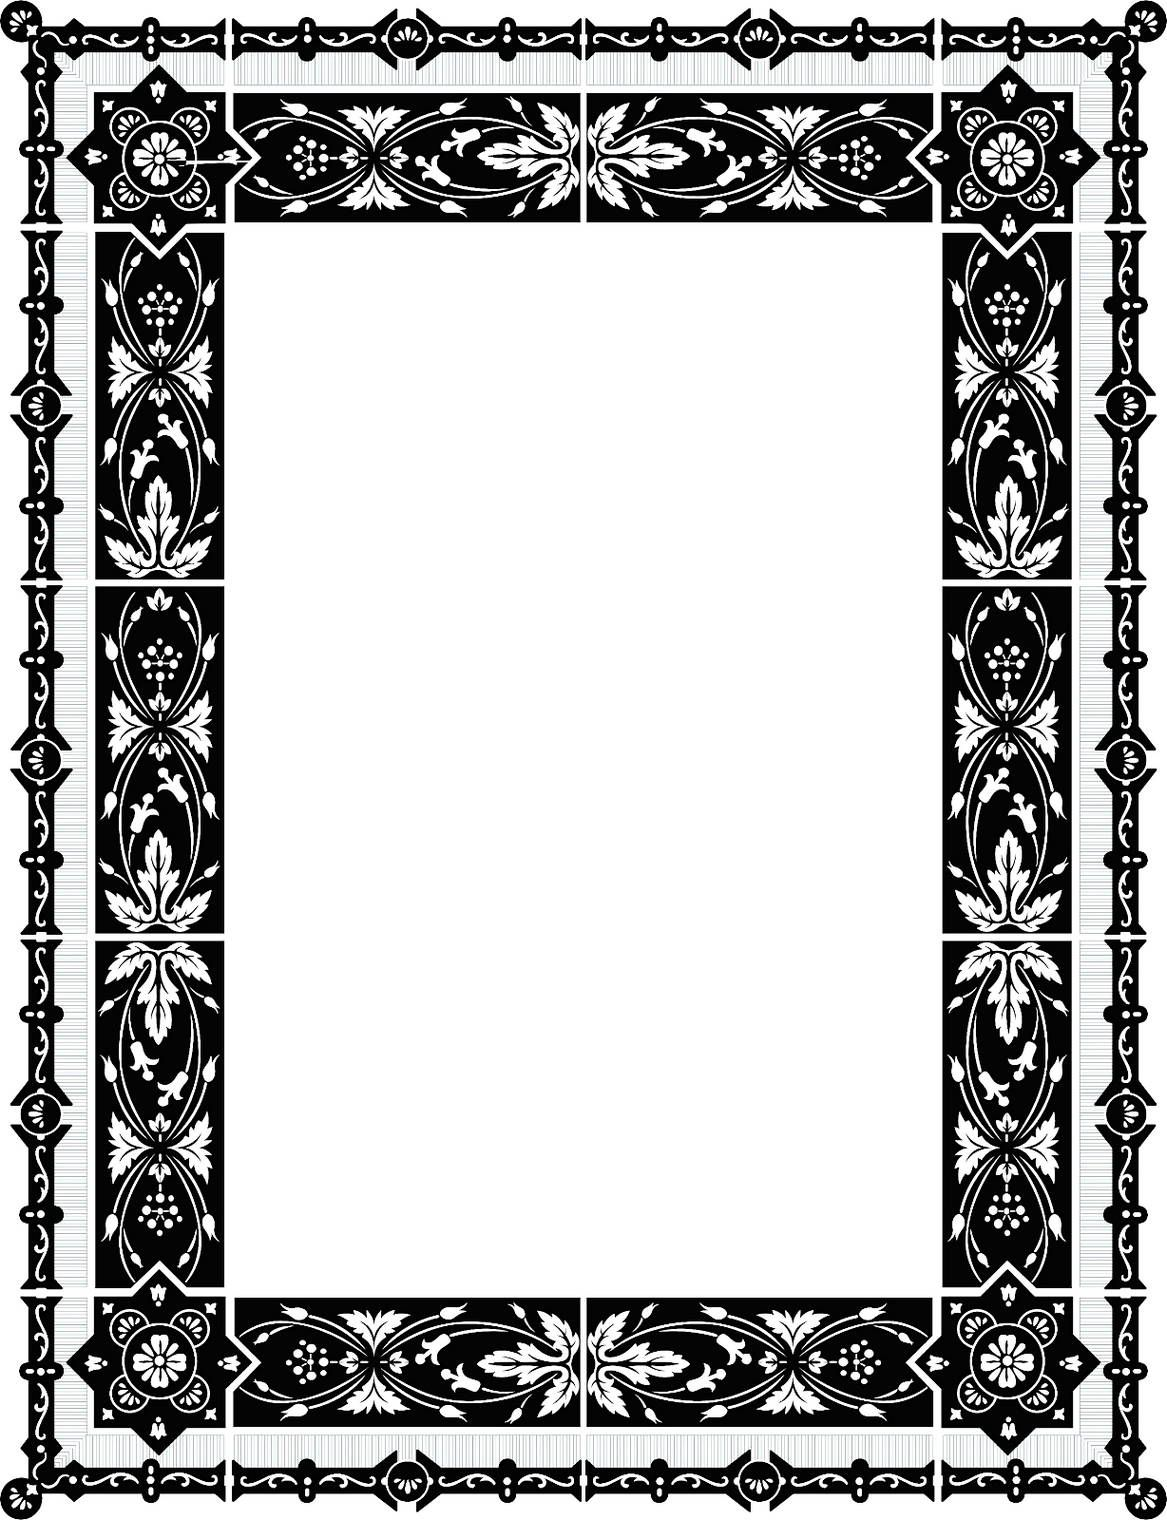 Bingkai Gambar Bunga Warna Hitam Putih Wallpaper Gambar Bingkai Bunga Hitam Putih Harian Nusantara Png Bingkai Ga In 2021 Ipad Mini Hp Android Iphone 2g